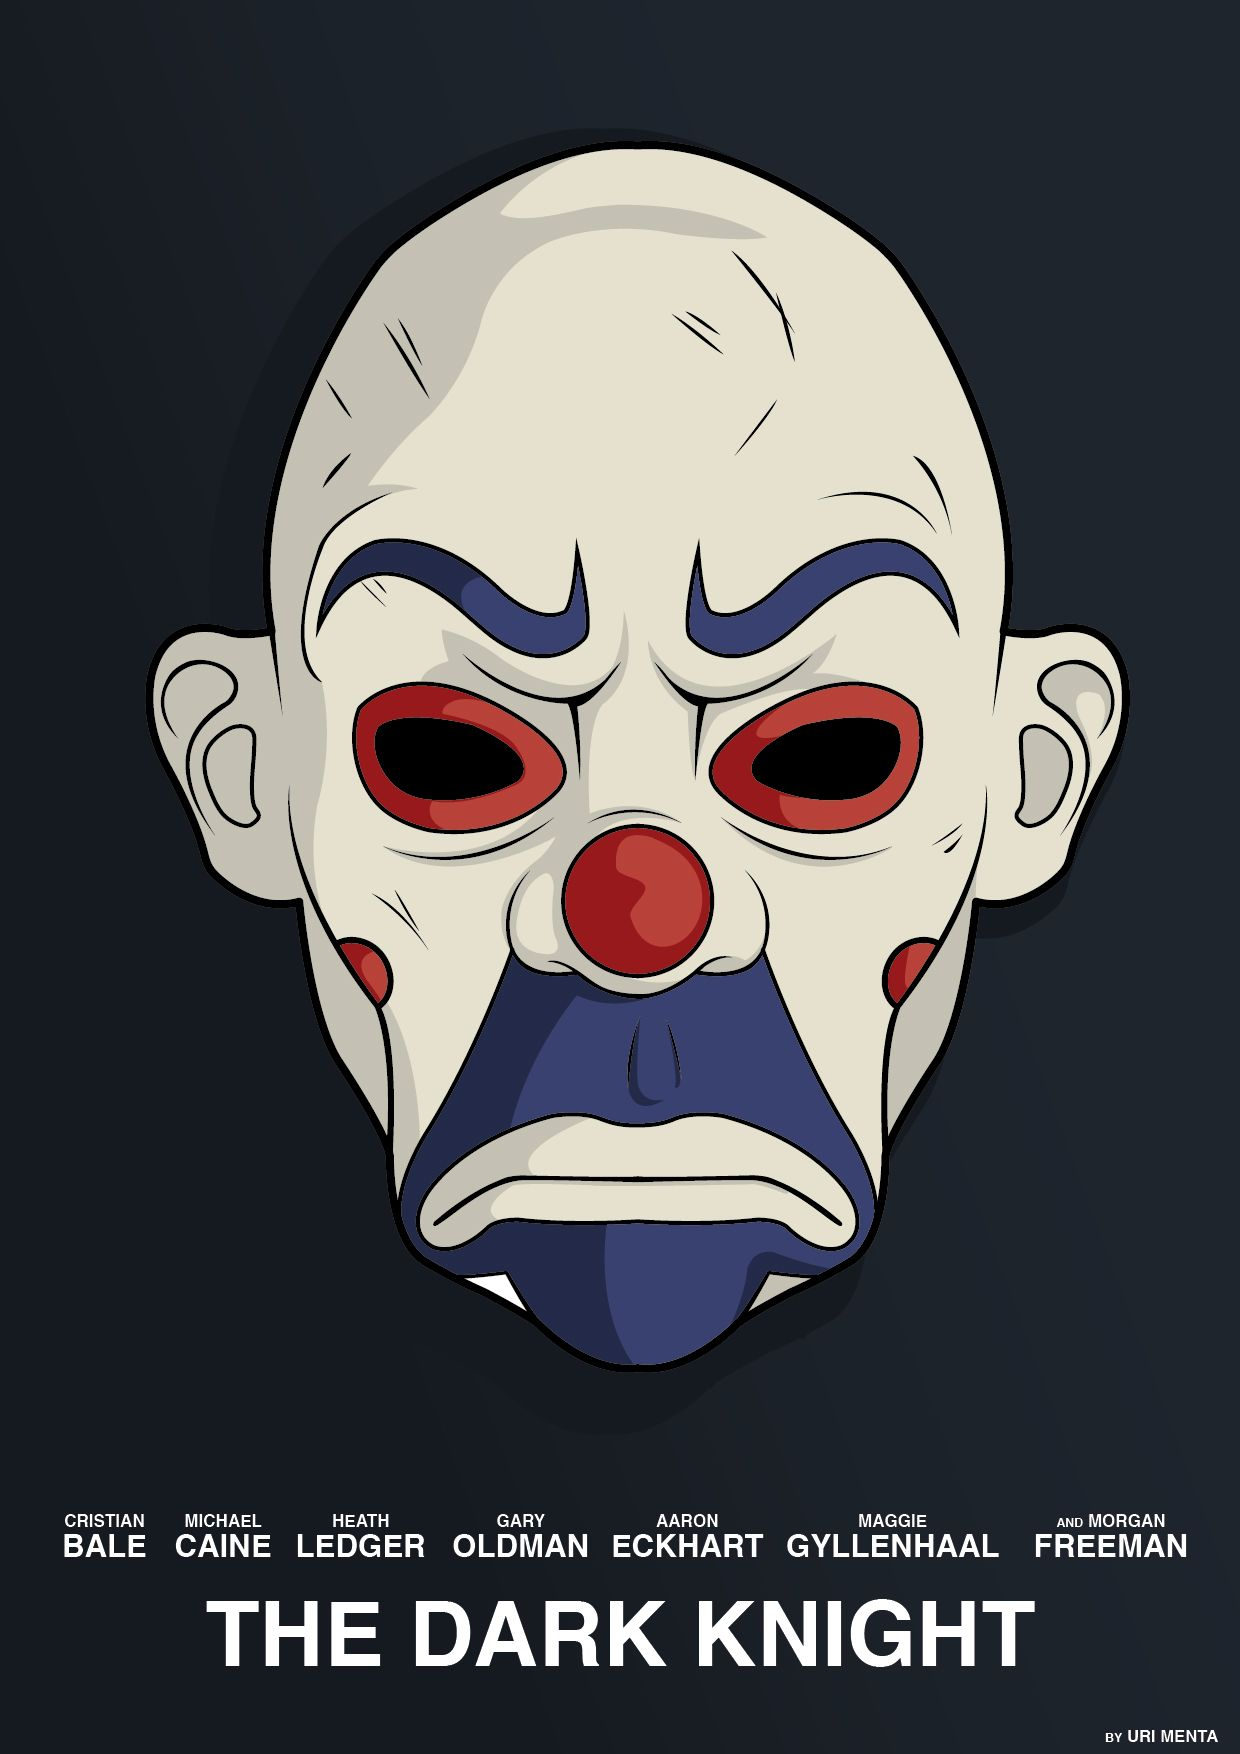 Joker s mask in the bank robbery movie poster  thejoker  batman   illustration 8bf943fd4e